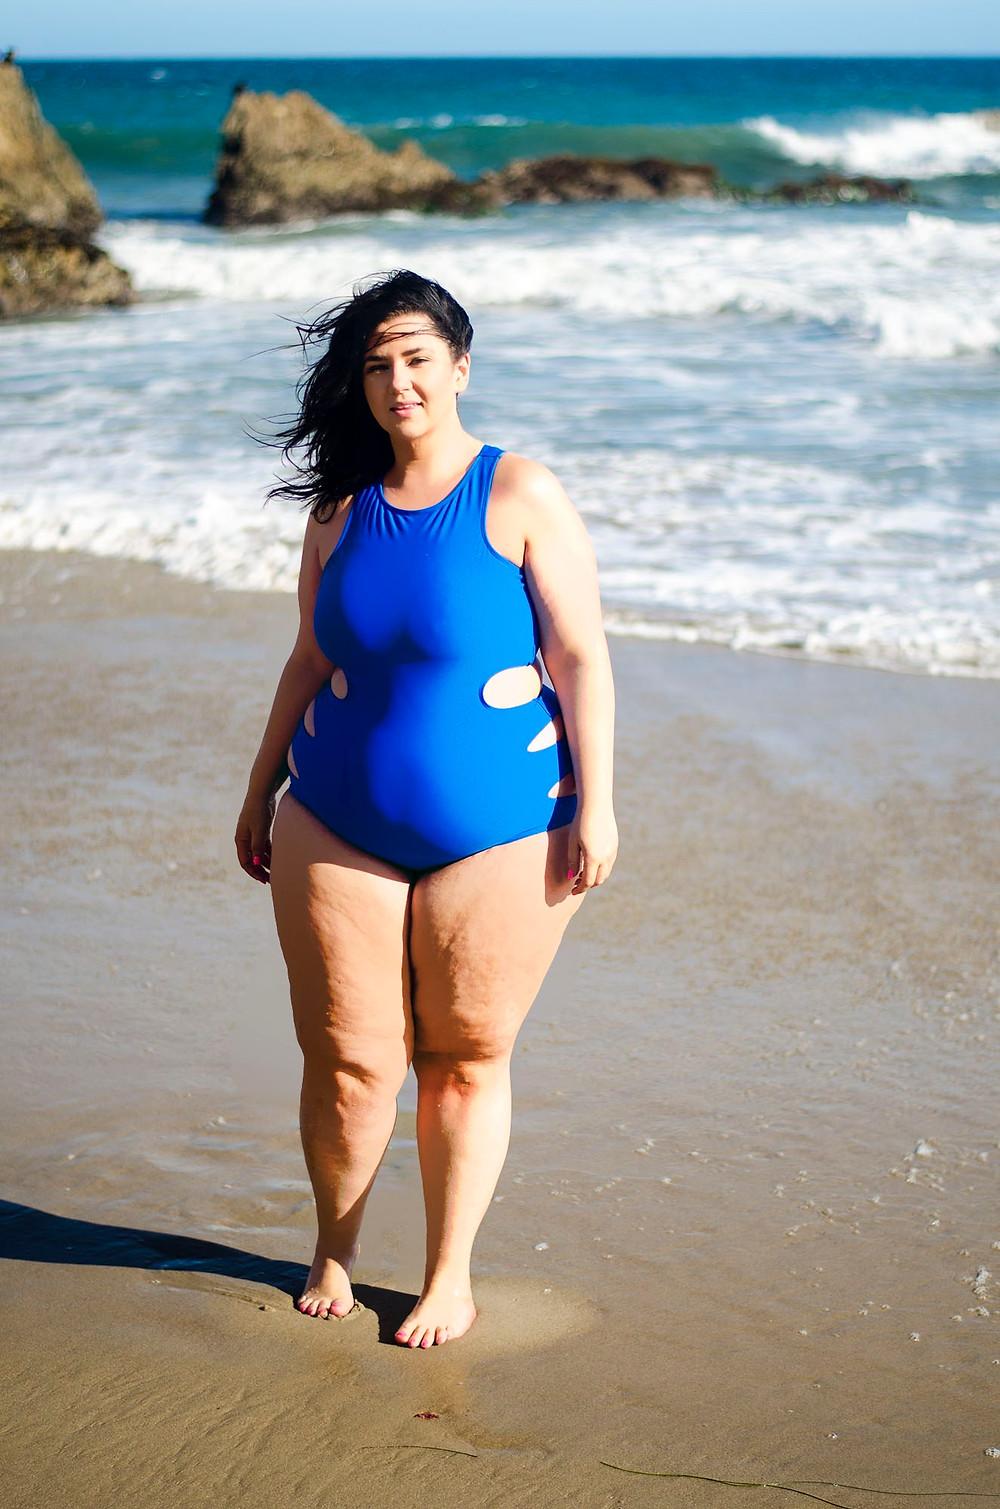 swim suit el matador beach plus size swimsuit ootd swim crystal coons sometimes glam swim week 2016 forever 21 plus